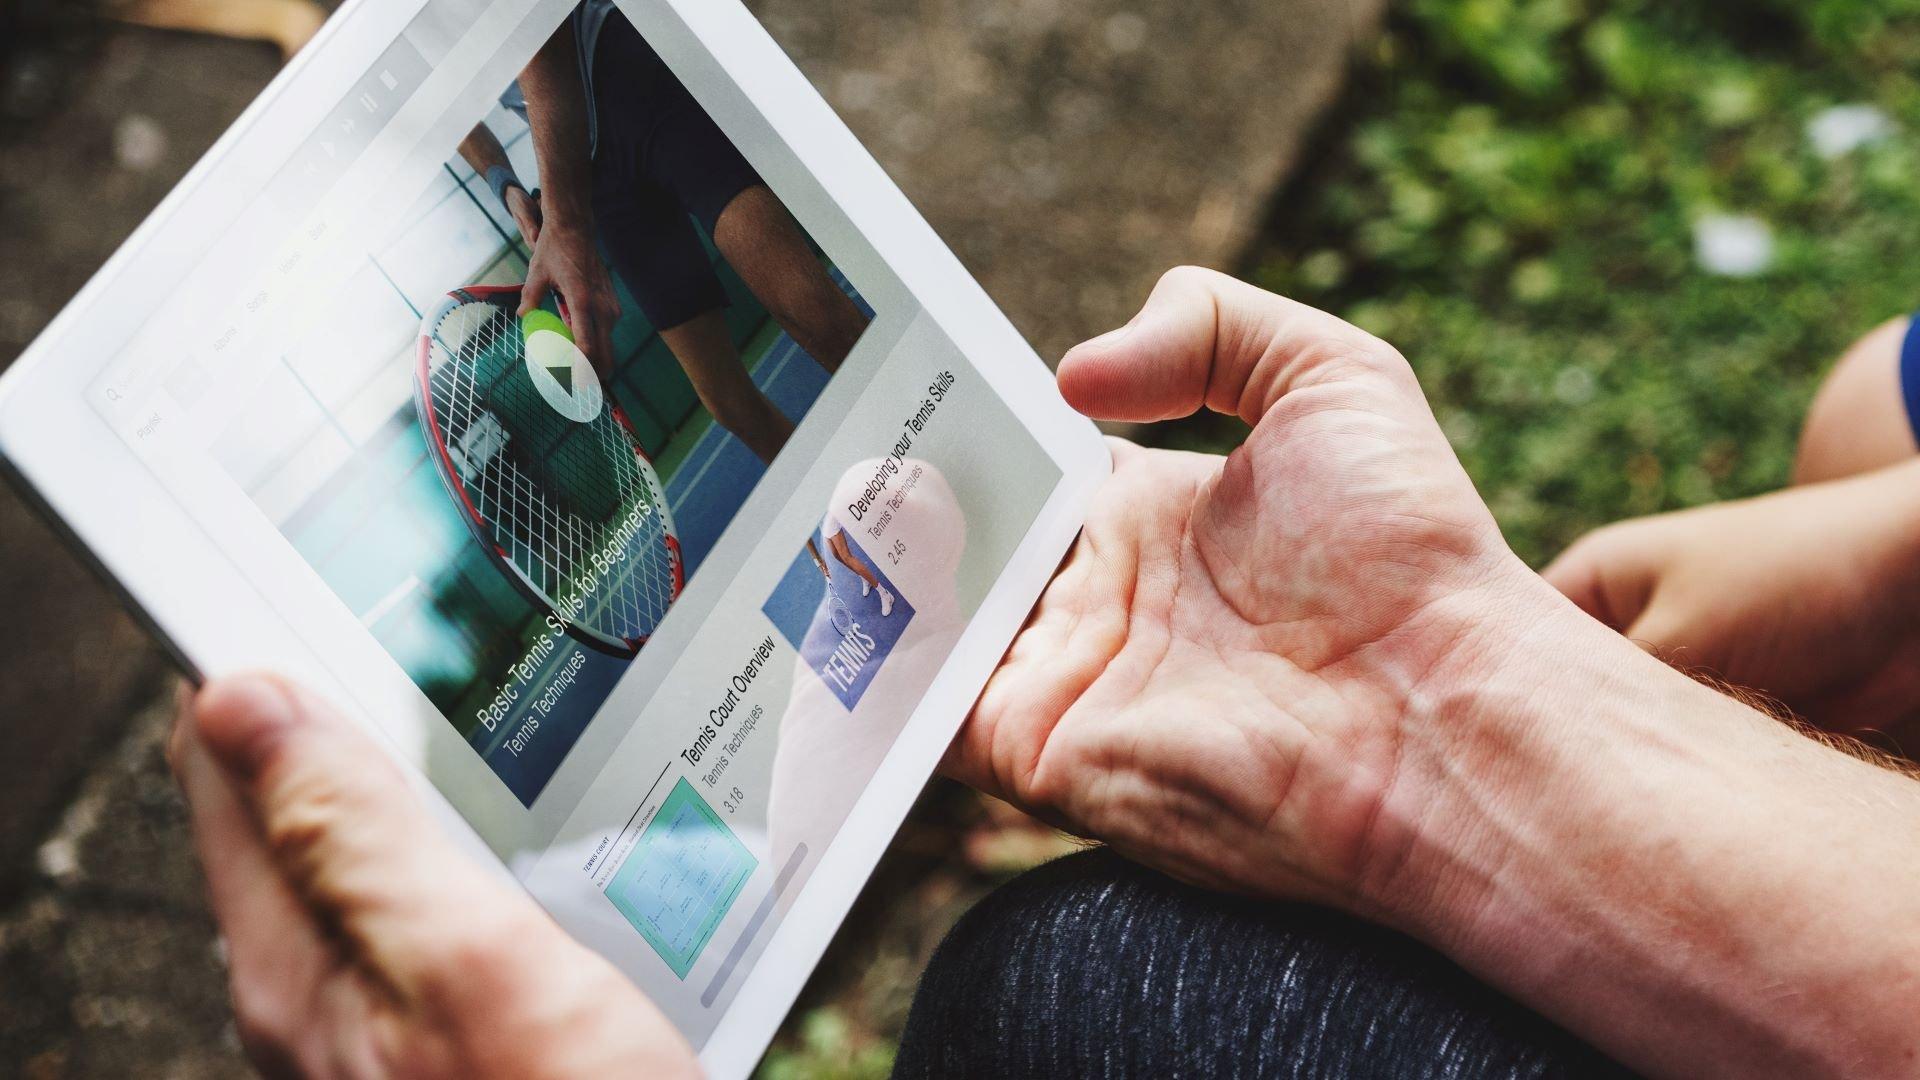 Customers watching tennis marketing videos on an iPad